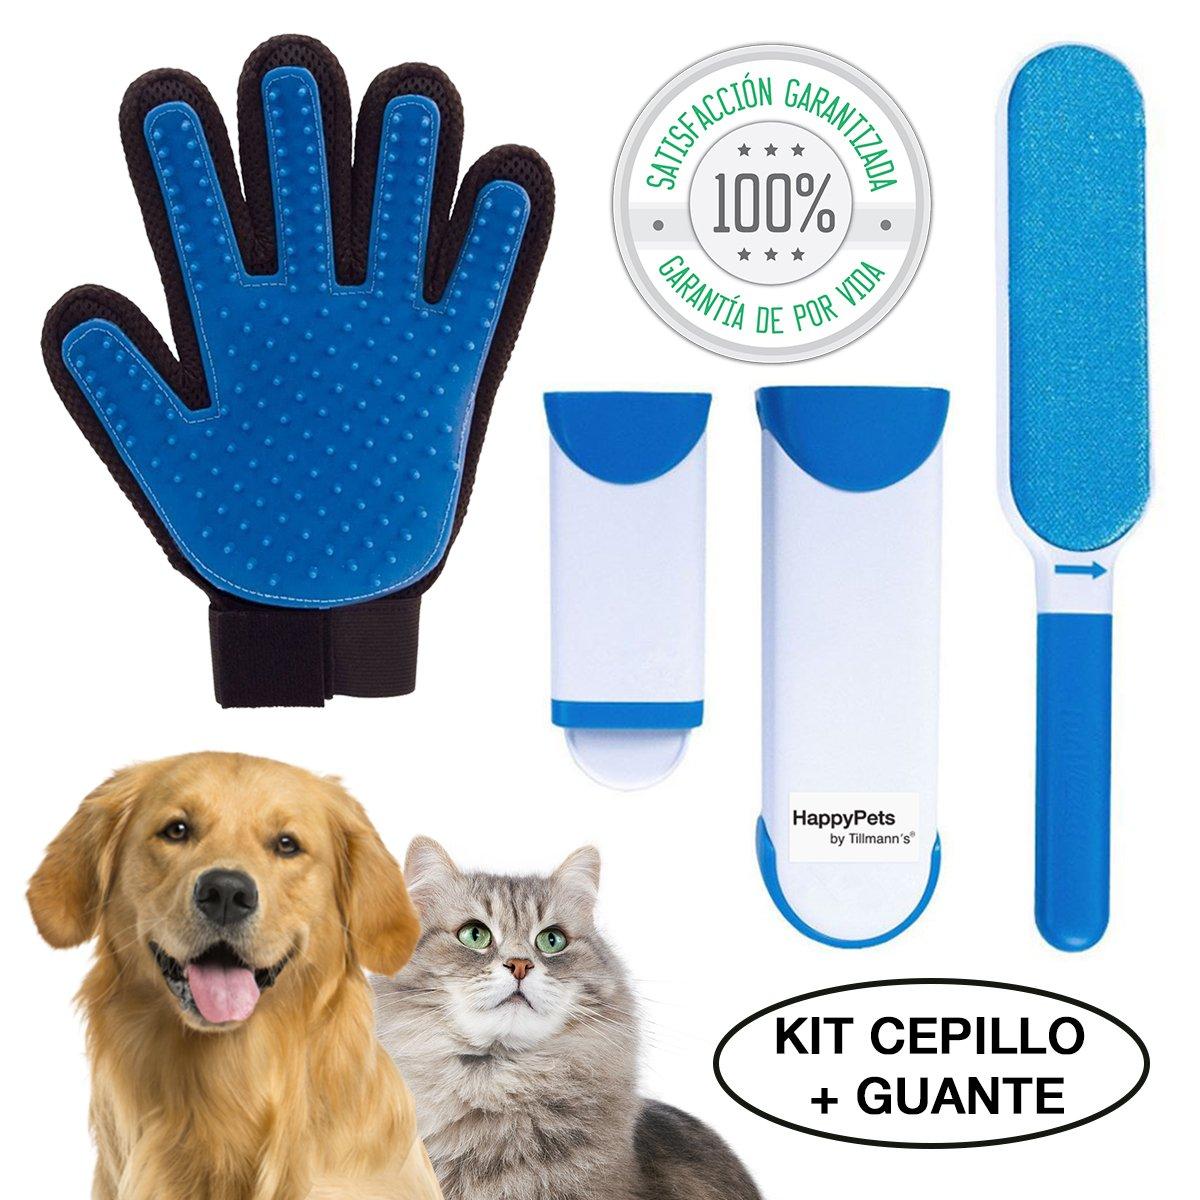 HappyPets Quita Pelos Gato - Perro - Mascotas   Cepillo Recoge Pelos   Atrapa Pelos Del Sofa O La Ropa   Quitapelos Pet Hair